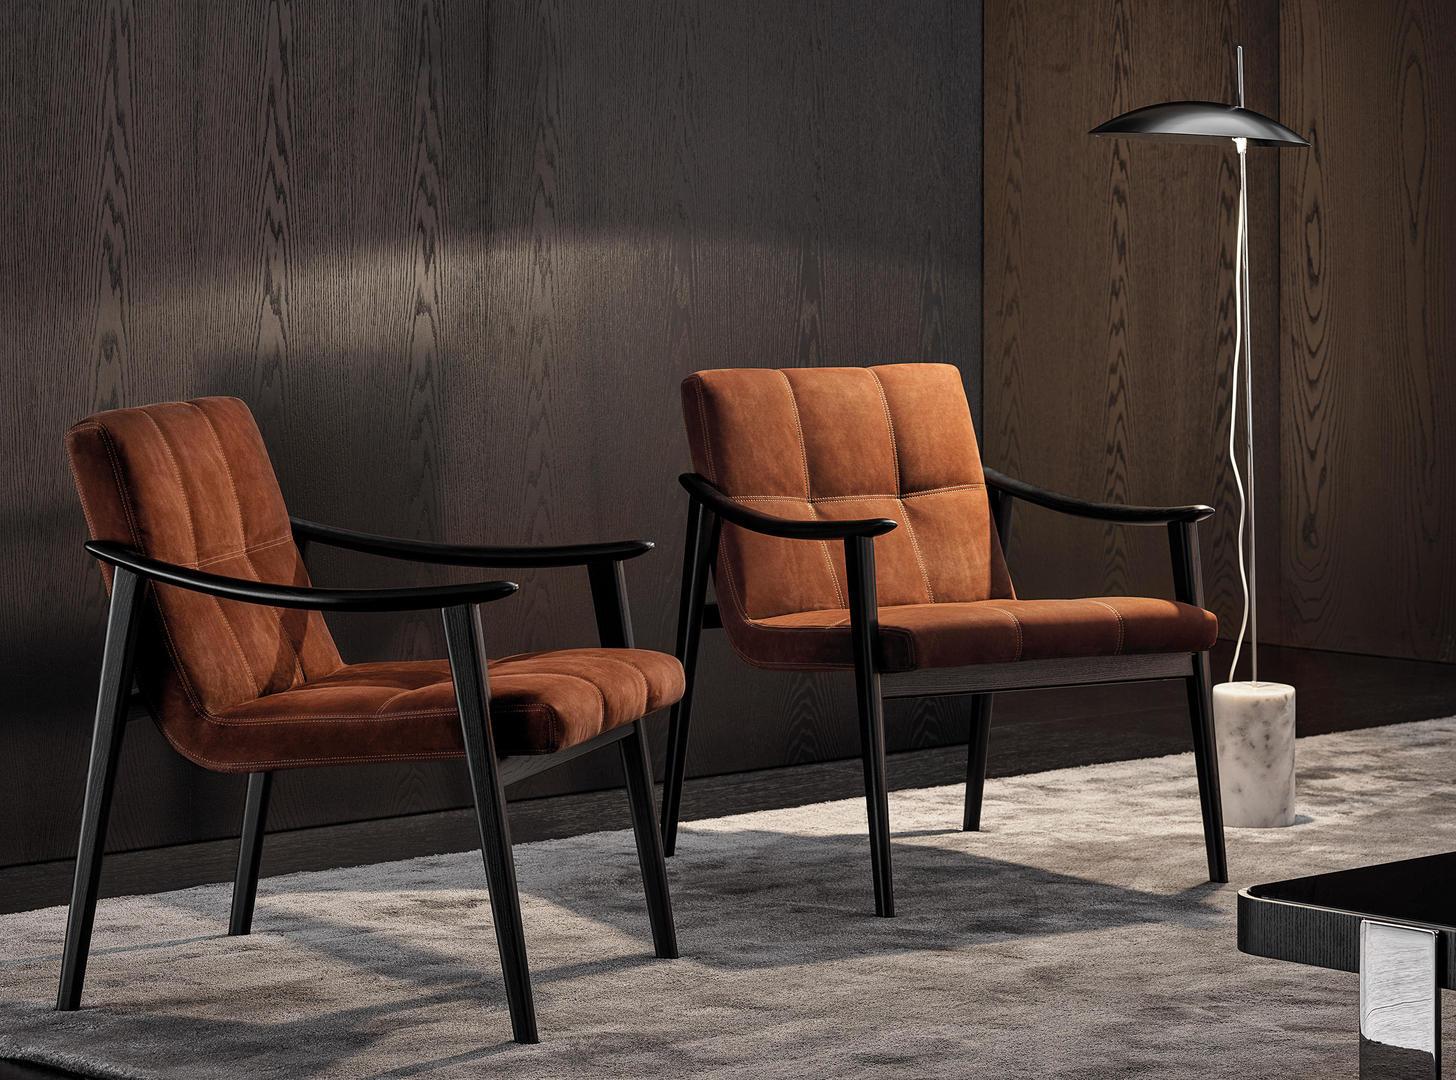 Minotti Fynn armchair dining chair Hora Barneveld 3.jpg